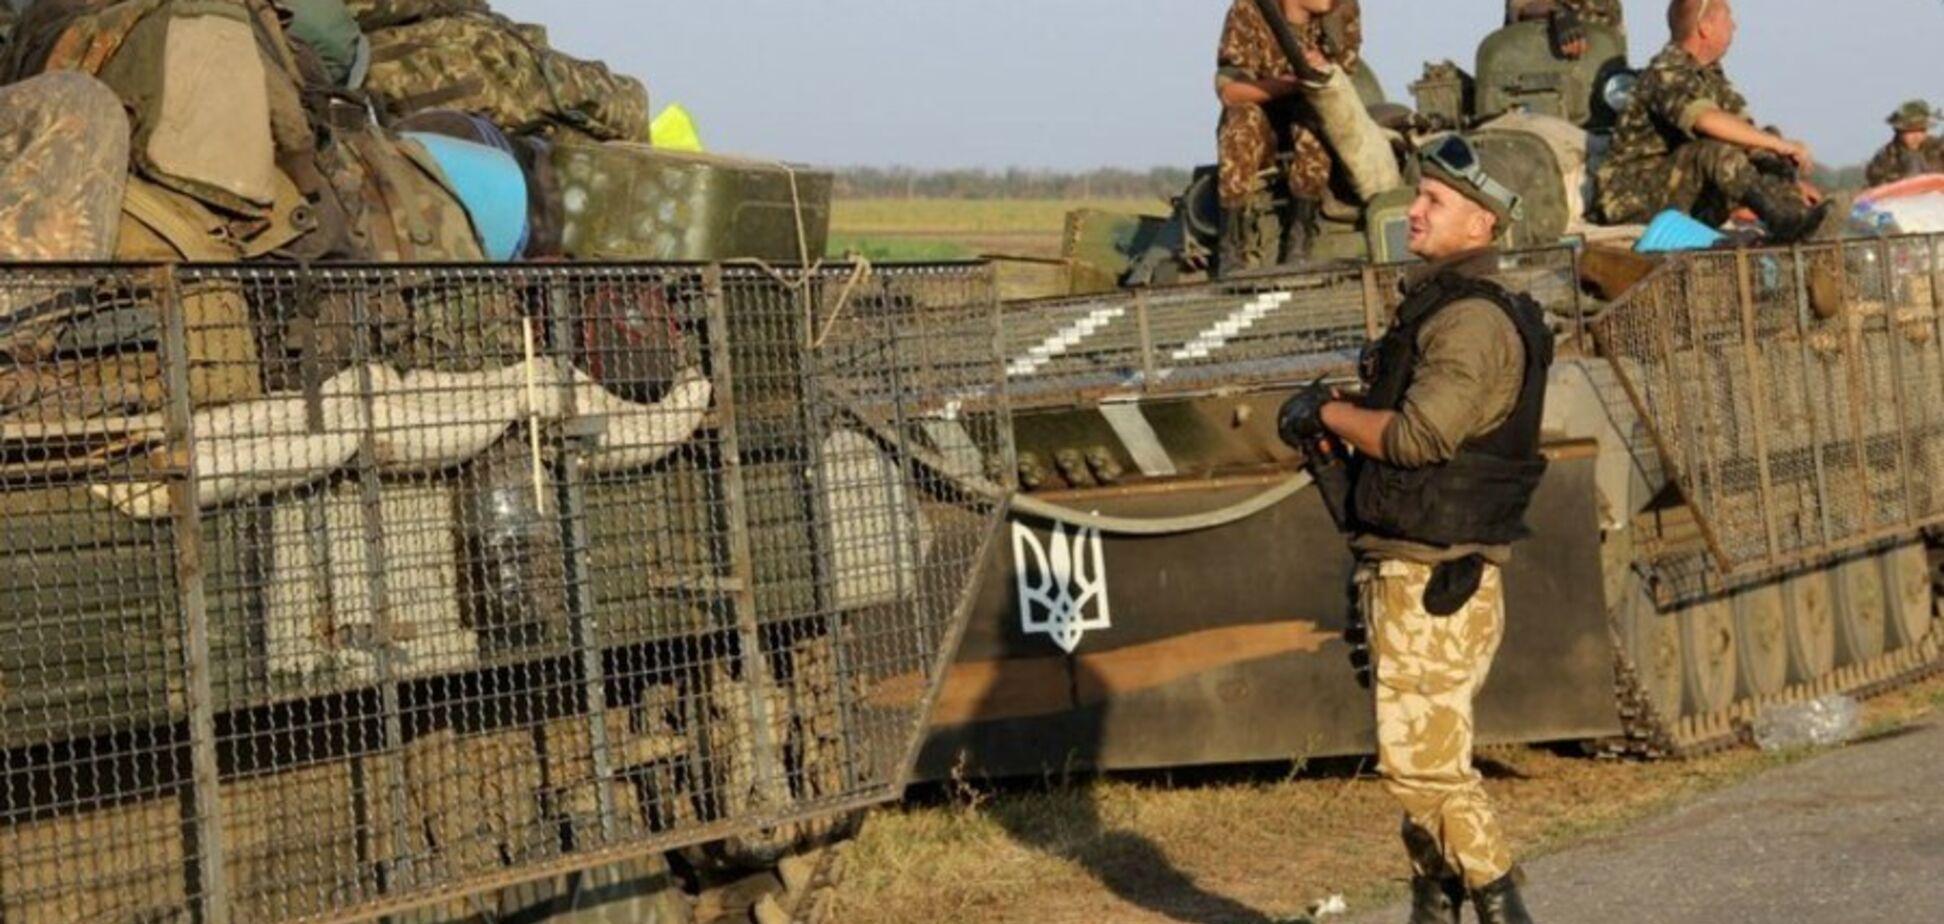 ВСУ дали террористам 'Л/ДНР' по зубам за убитых товарищей: итоги боев